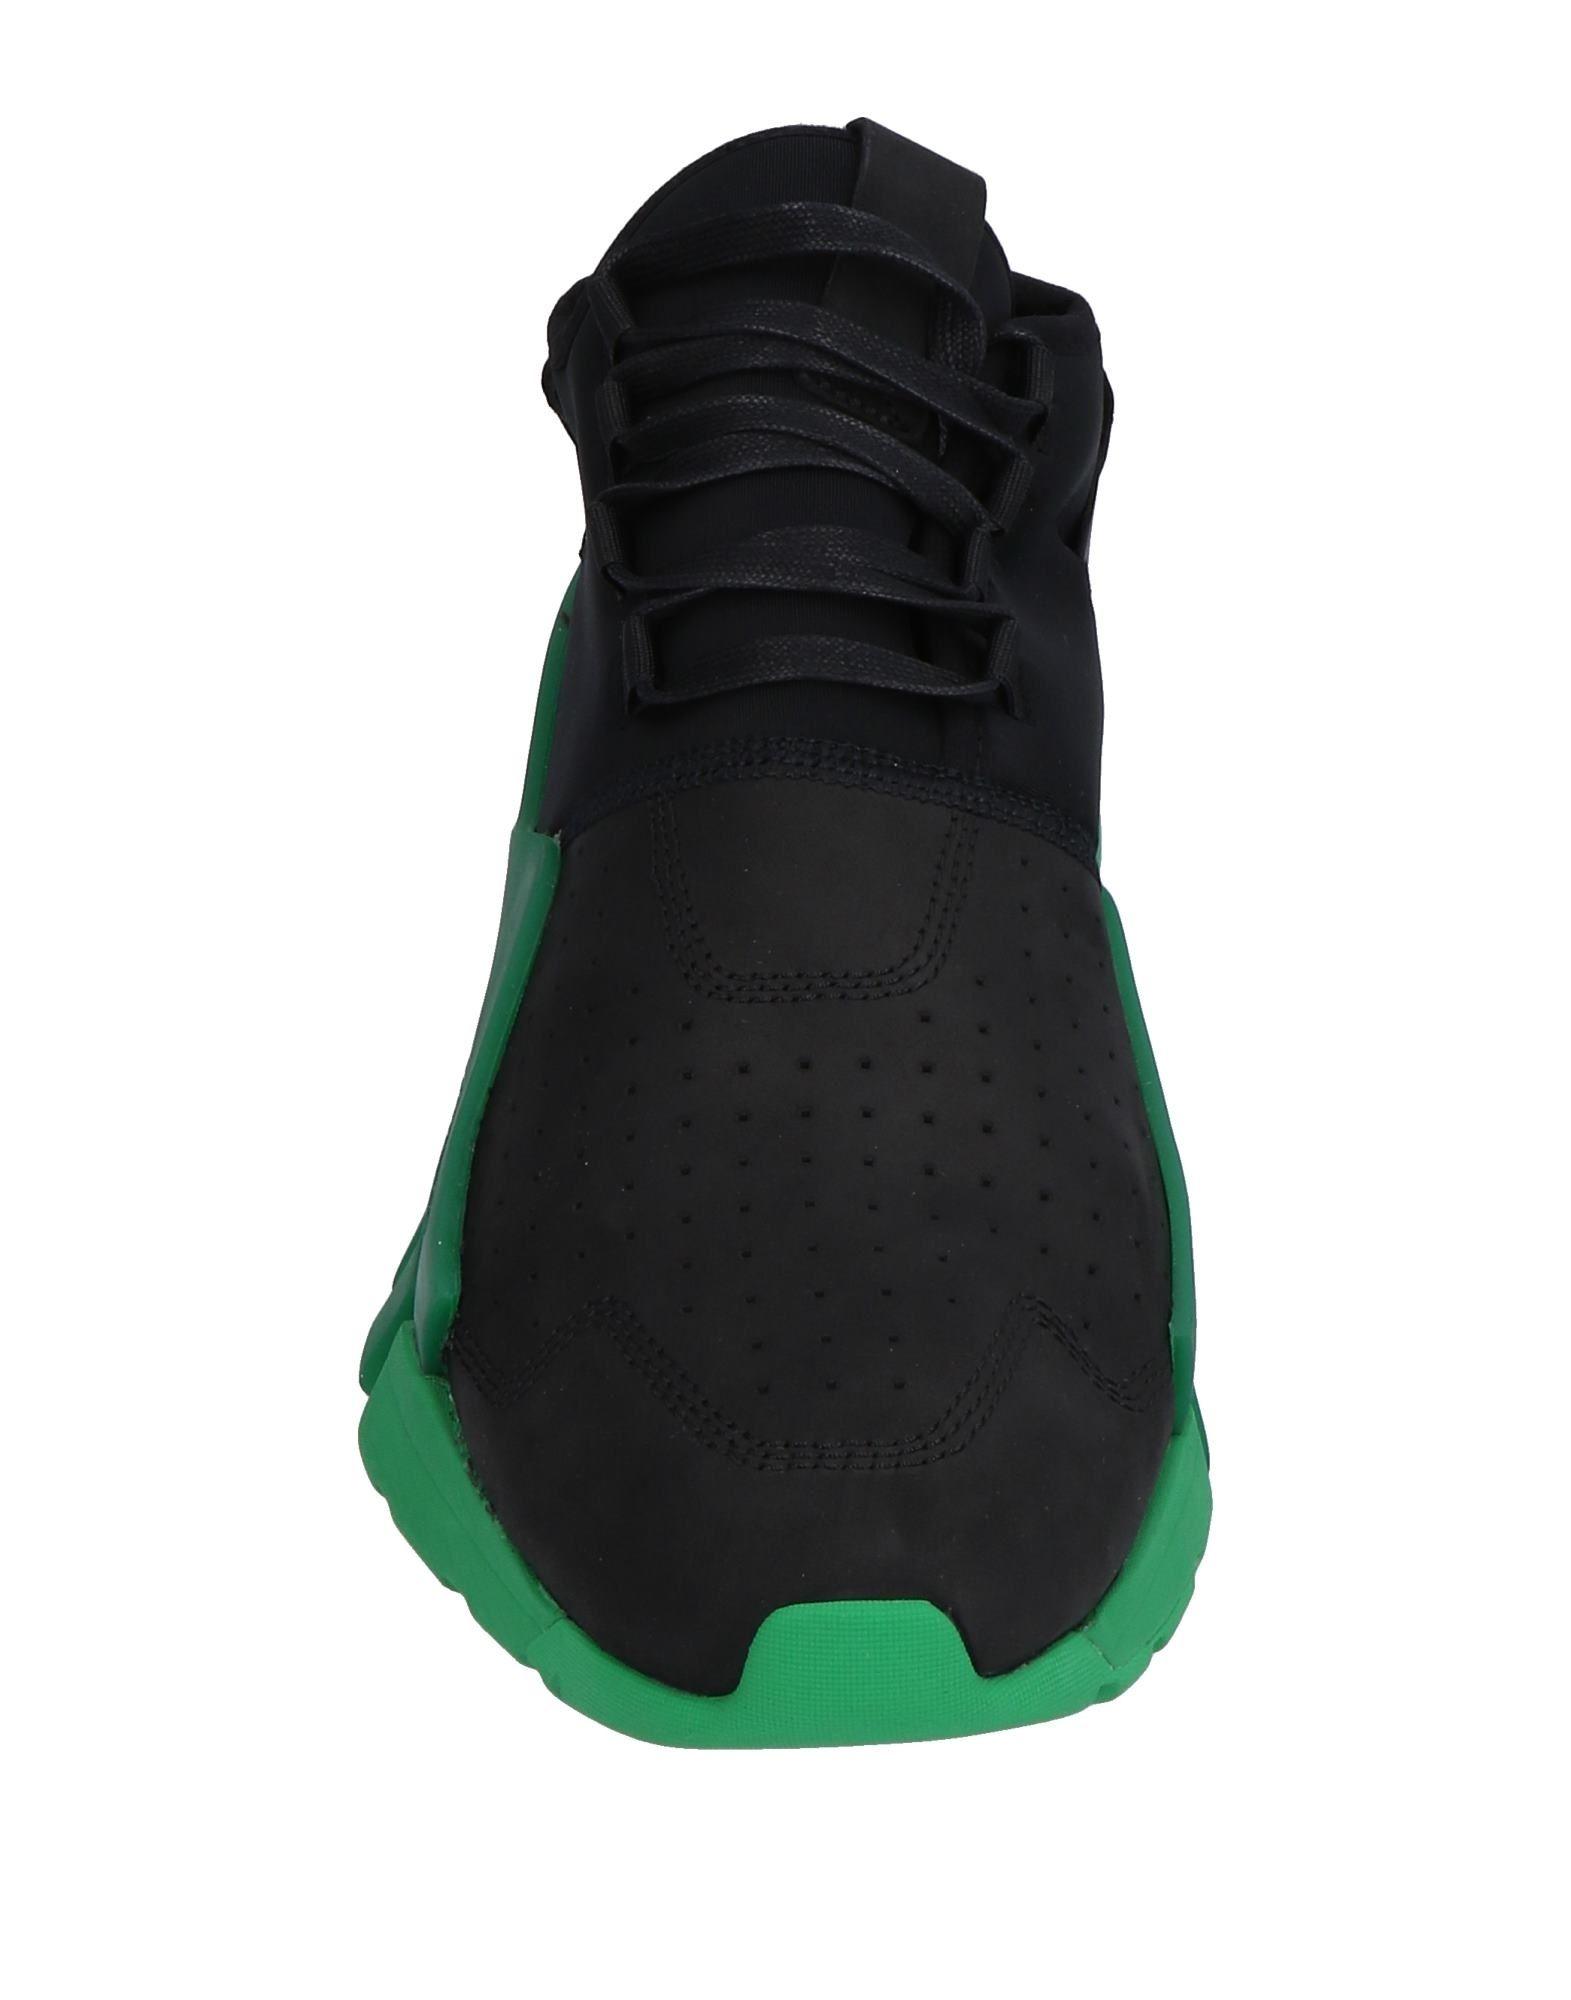 Adidas Herren By Yohji Yamamoto Sneakers Herren Adidas  11494547NM Gute Qualität beliebte Schuhe 4c4059